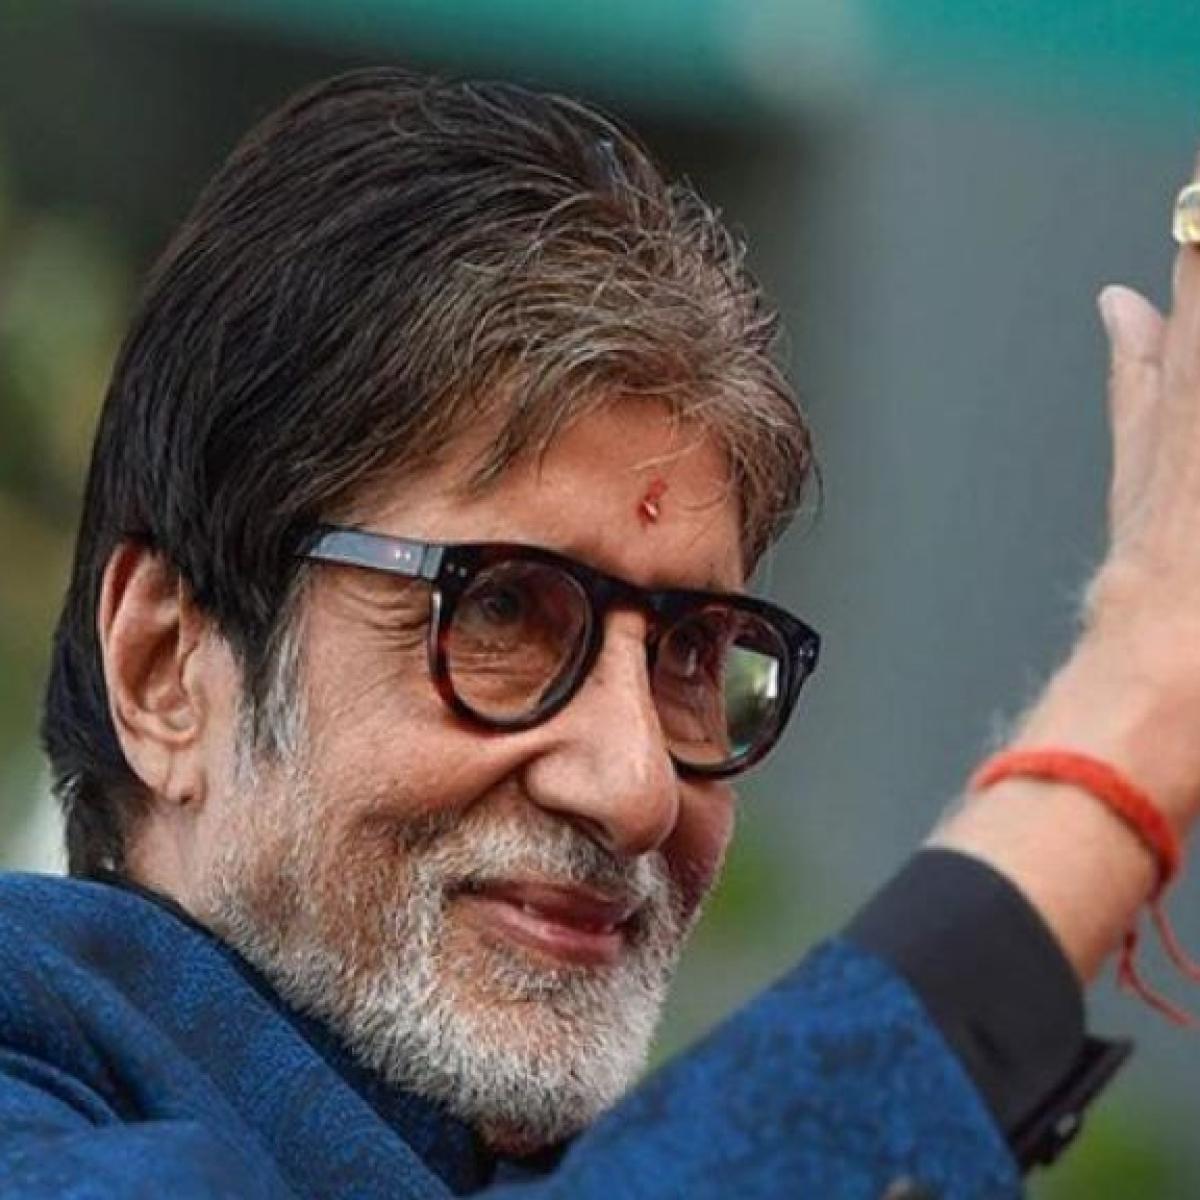 Amitabh Bachchan sends 10 ventilators to BMC, orders 50 oxygen concentrators from Poland amid COVID-19 crisis